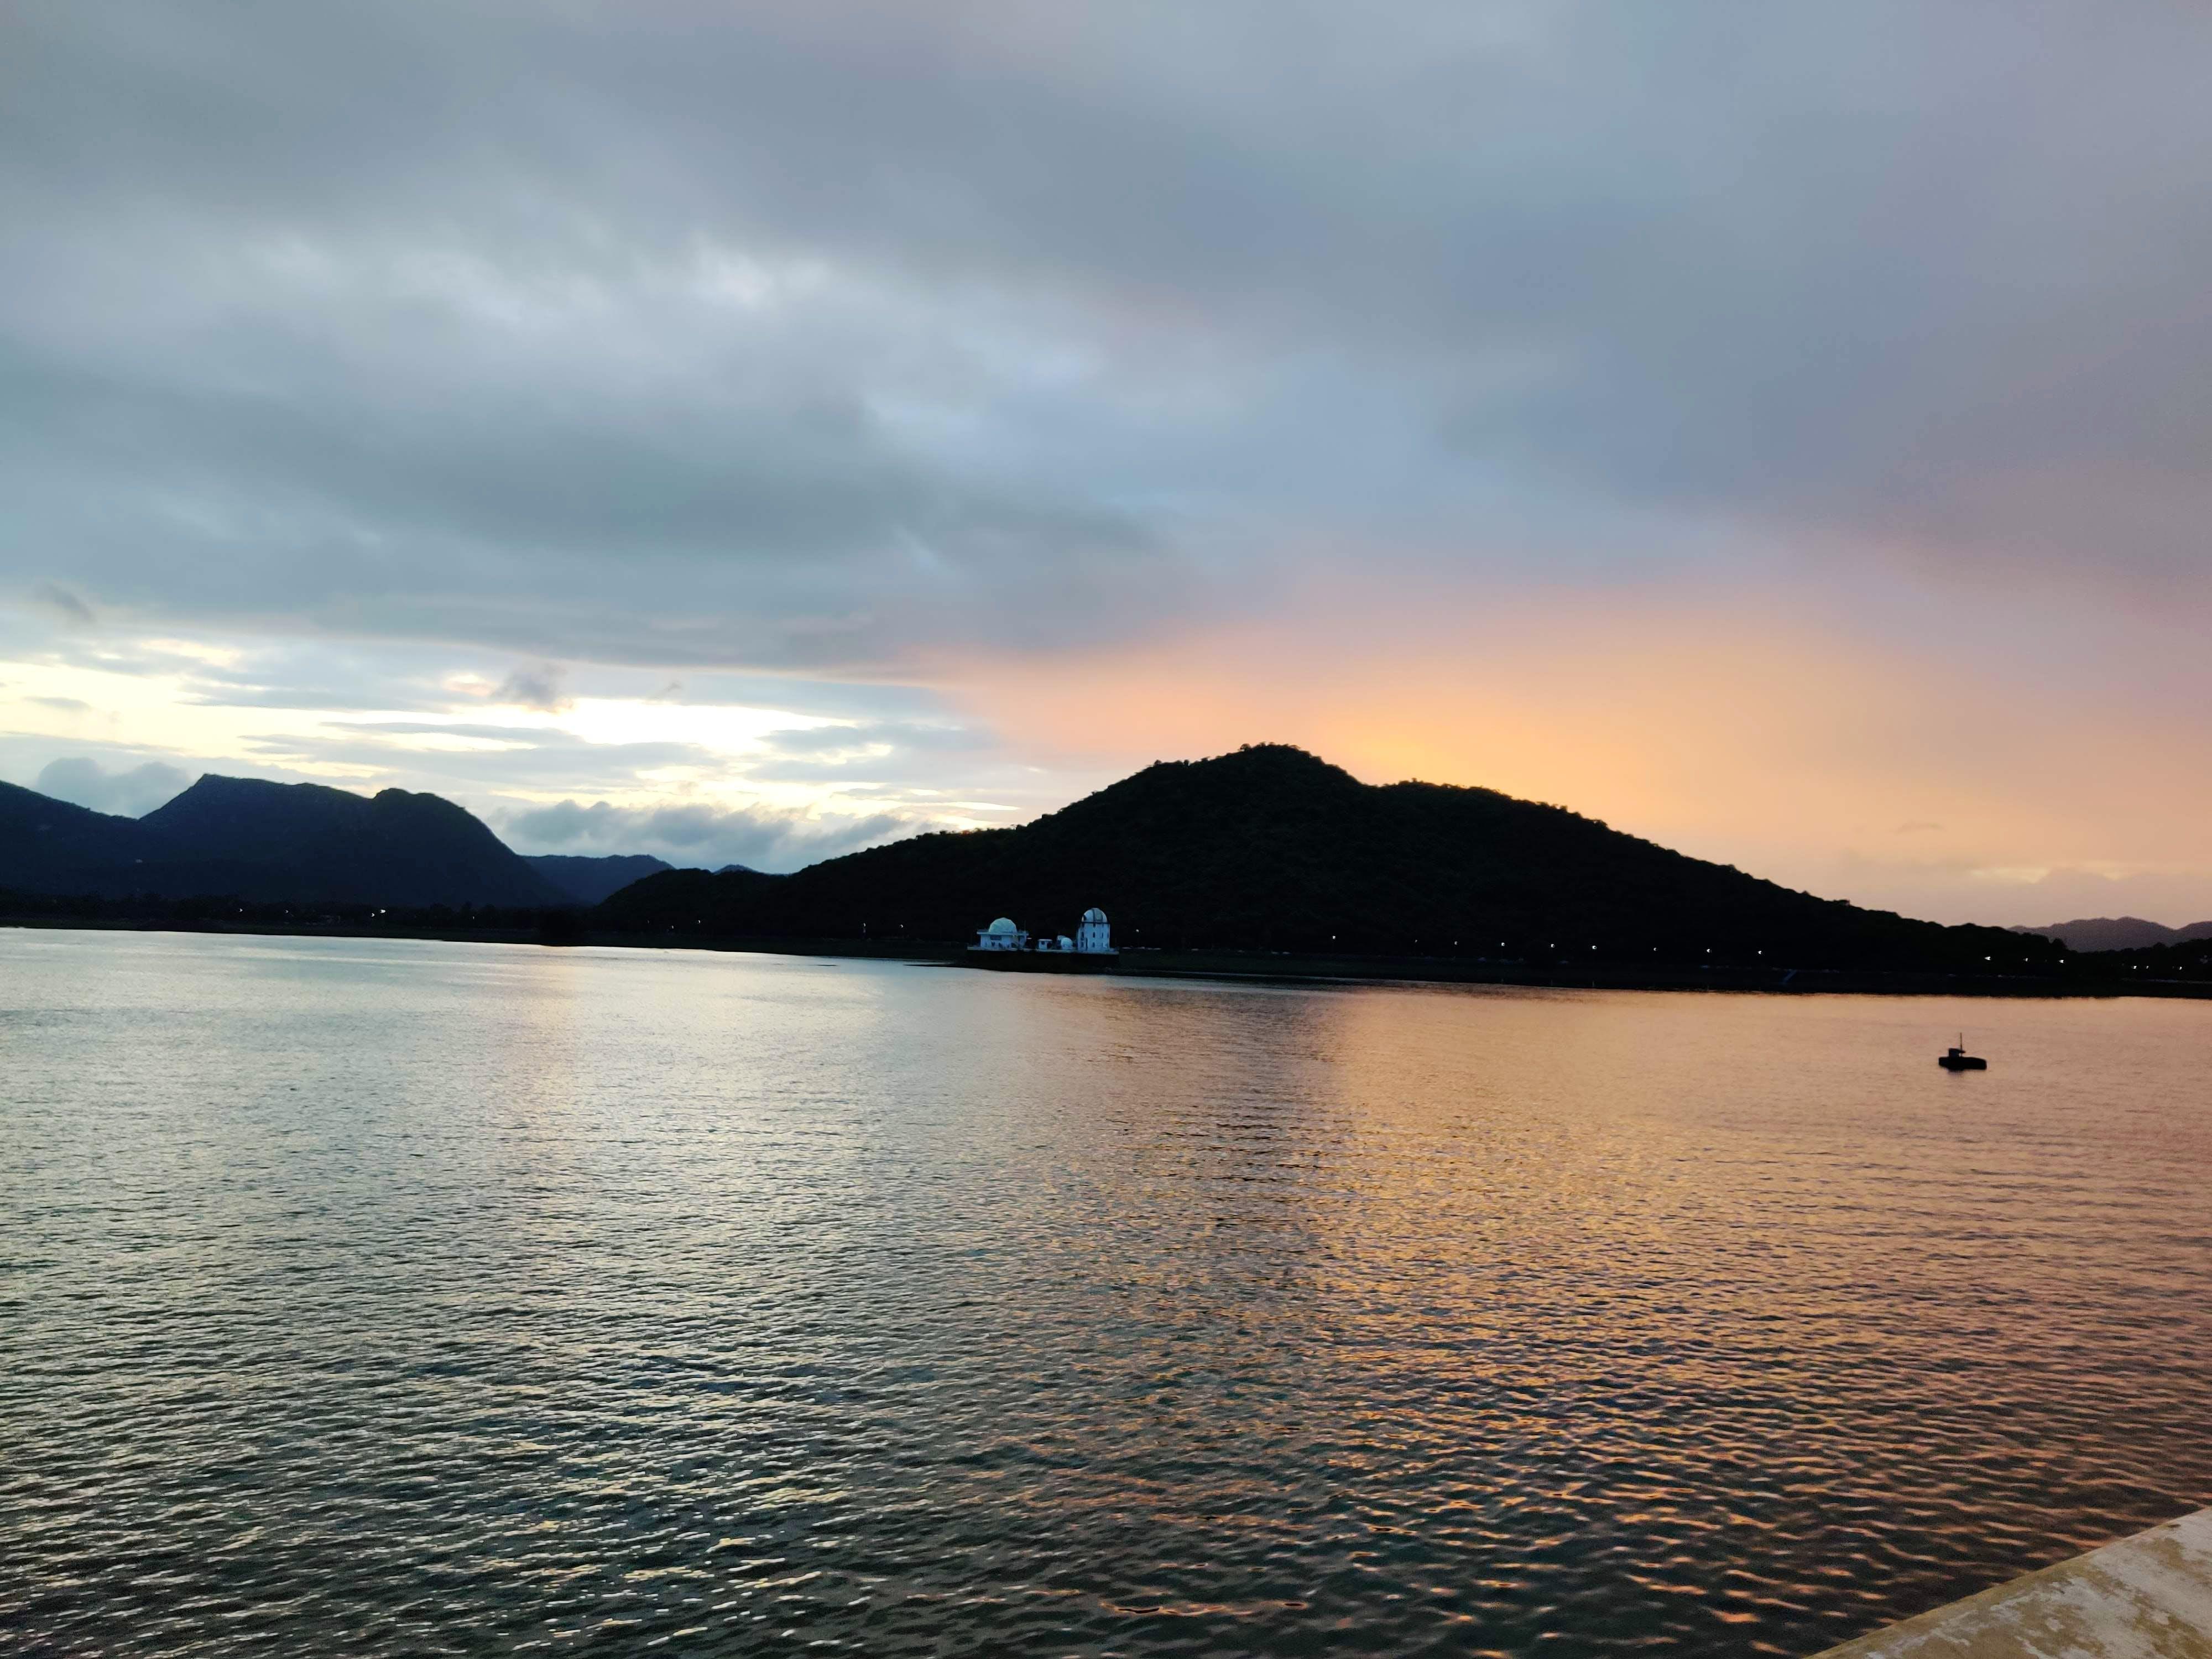 Body of water,Sky,Highland,Water,Mountain,Lake,Sea,Cloud,Loch,Mountainous landforms